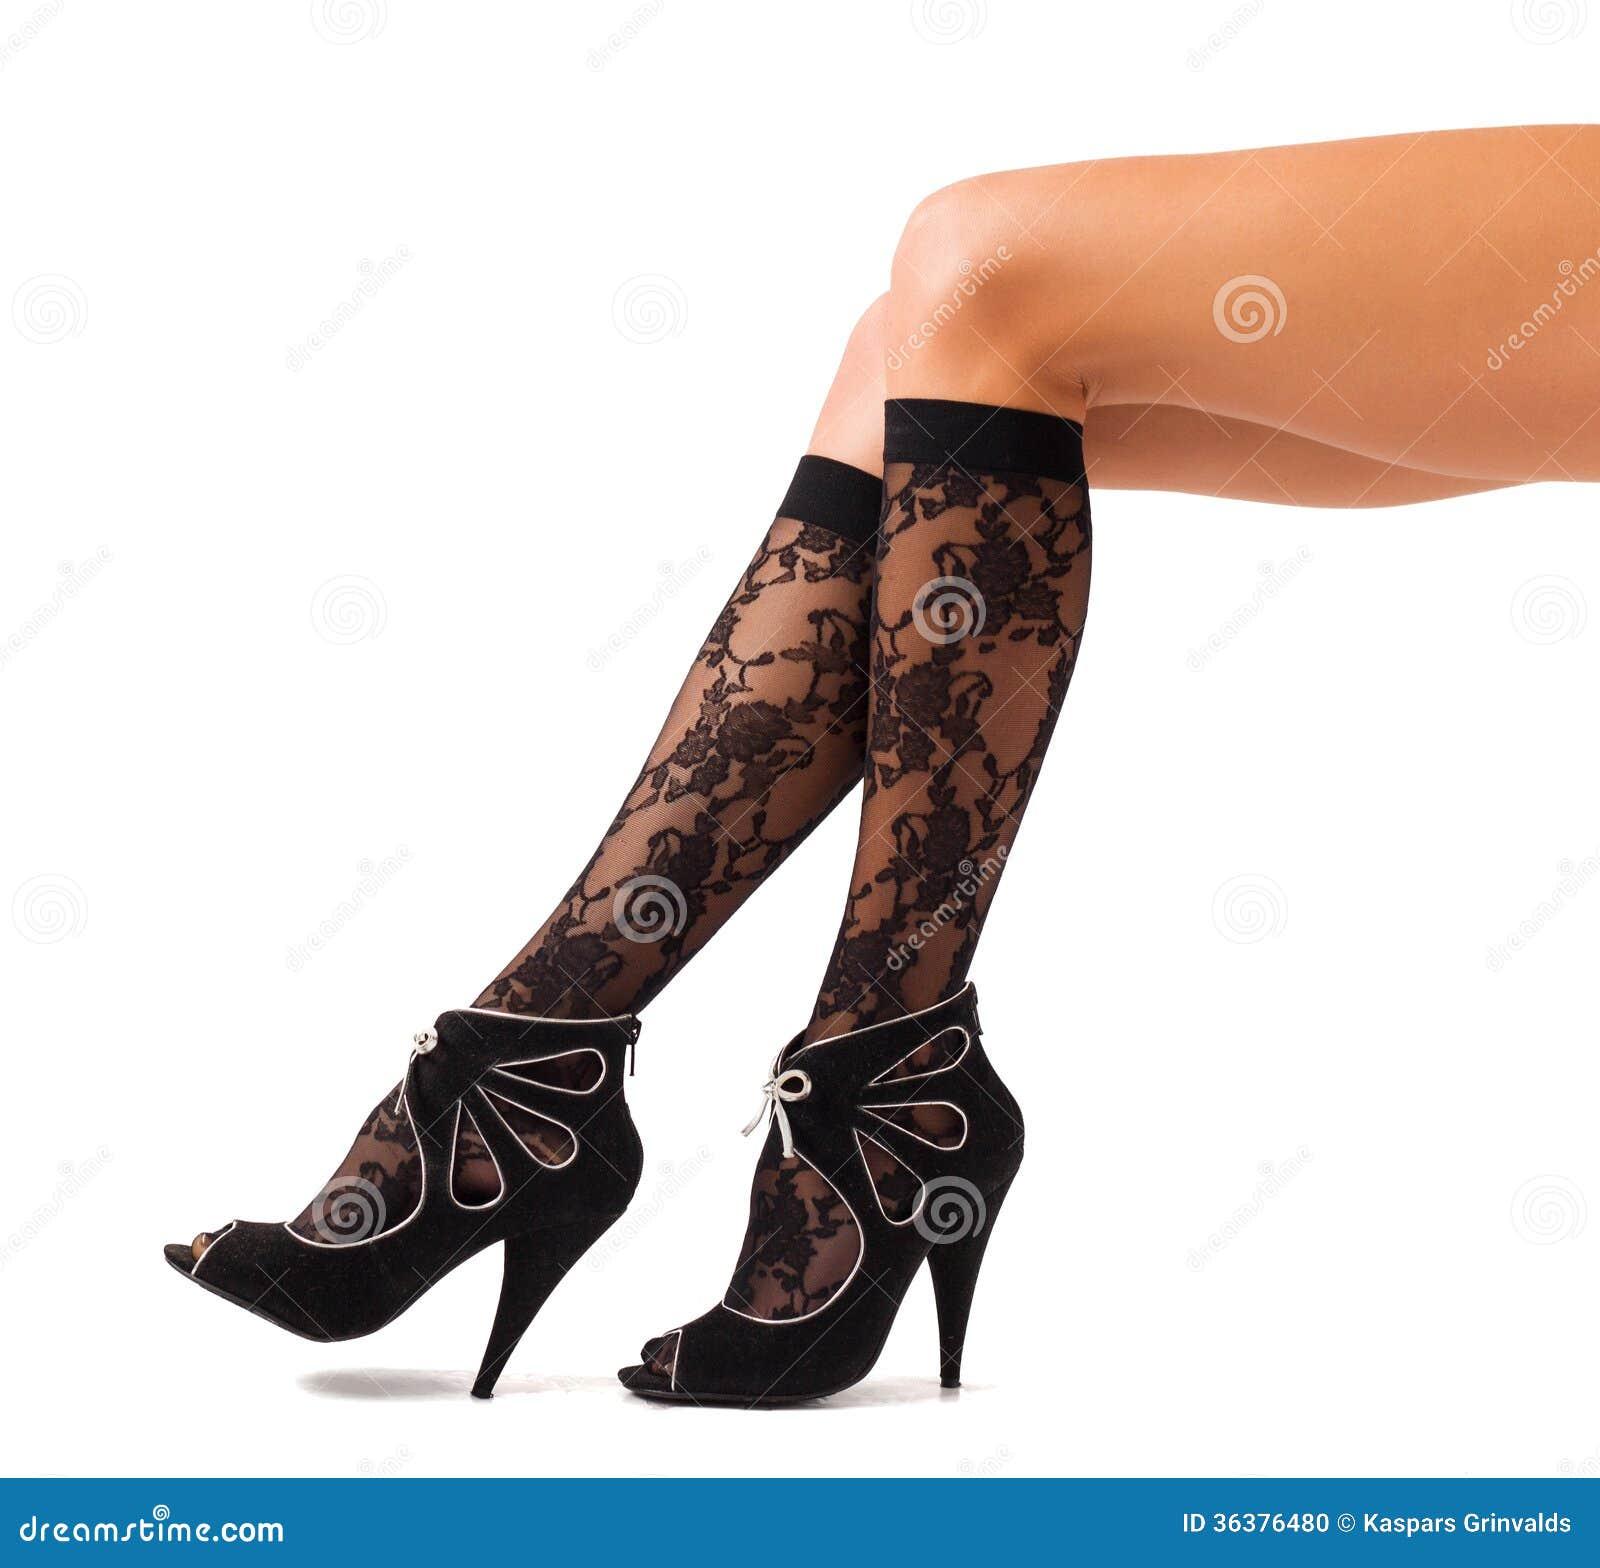 Stylish Black Woman: Women Legs In Stylish Black Socks And High Heel Shoes